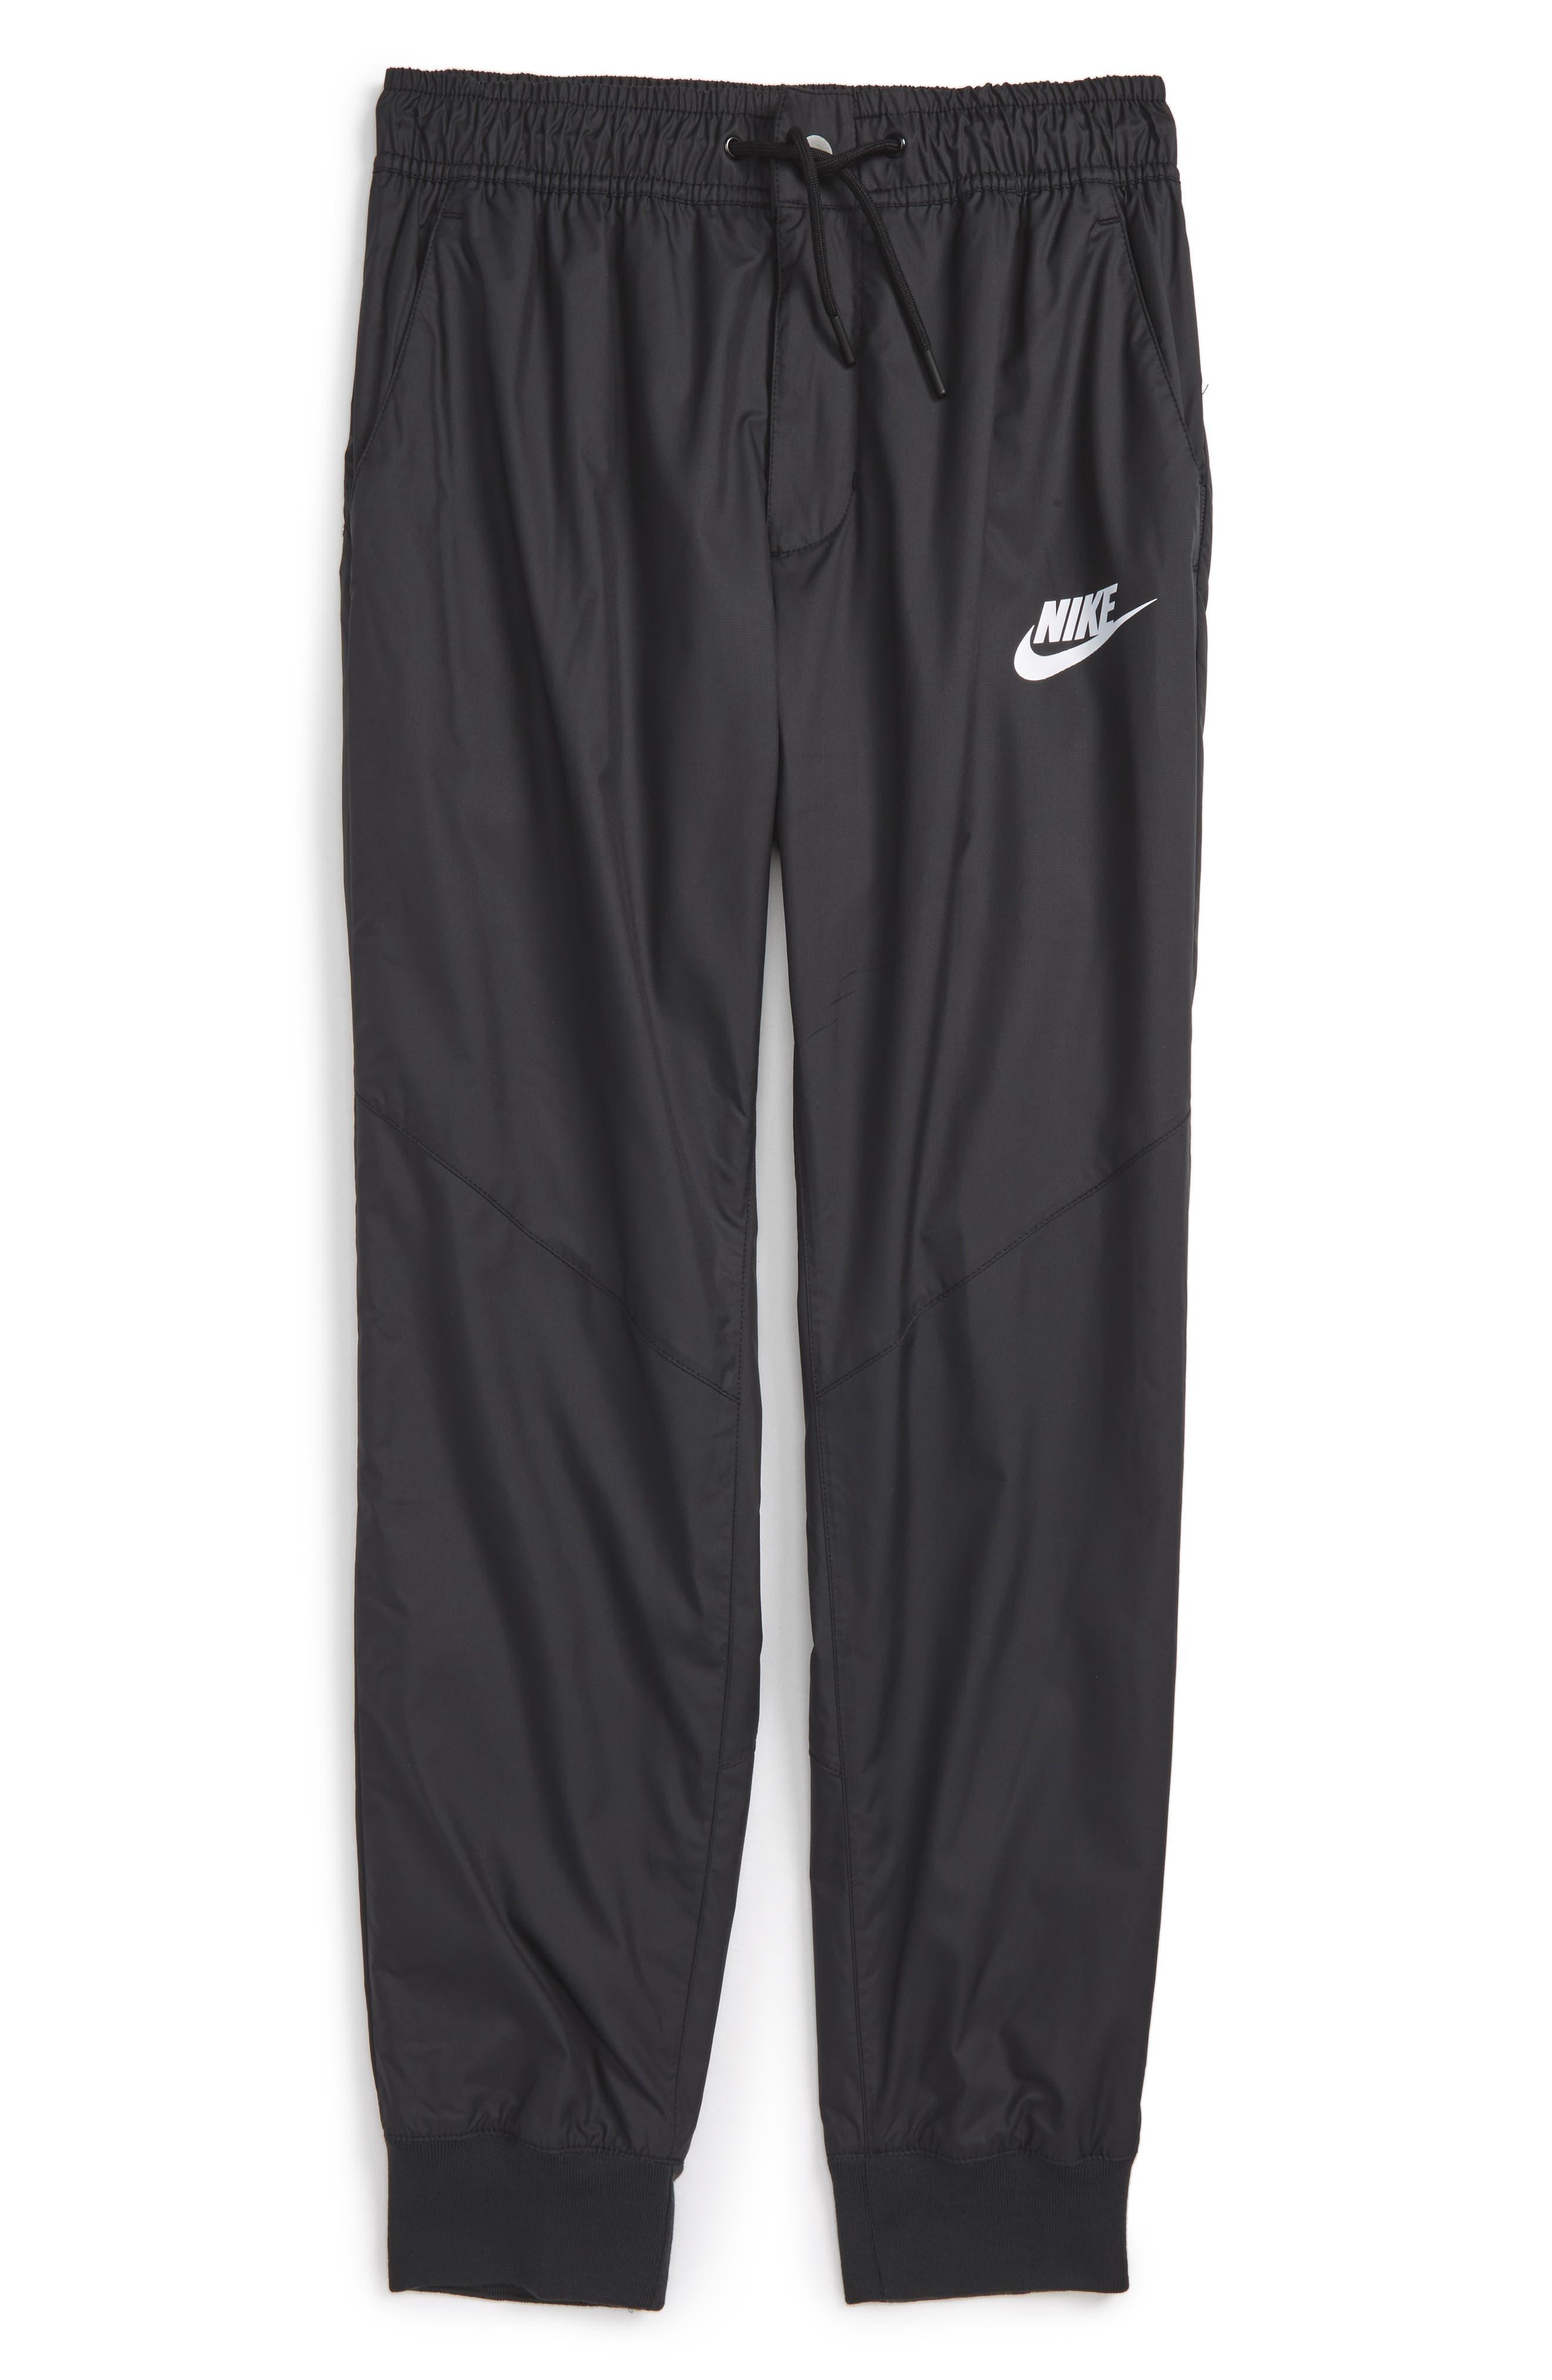 Sportswear Water Resistant Pants,                         Main,                         color, 010